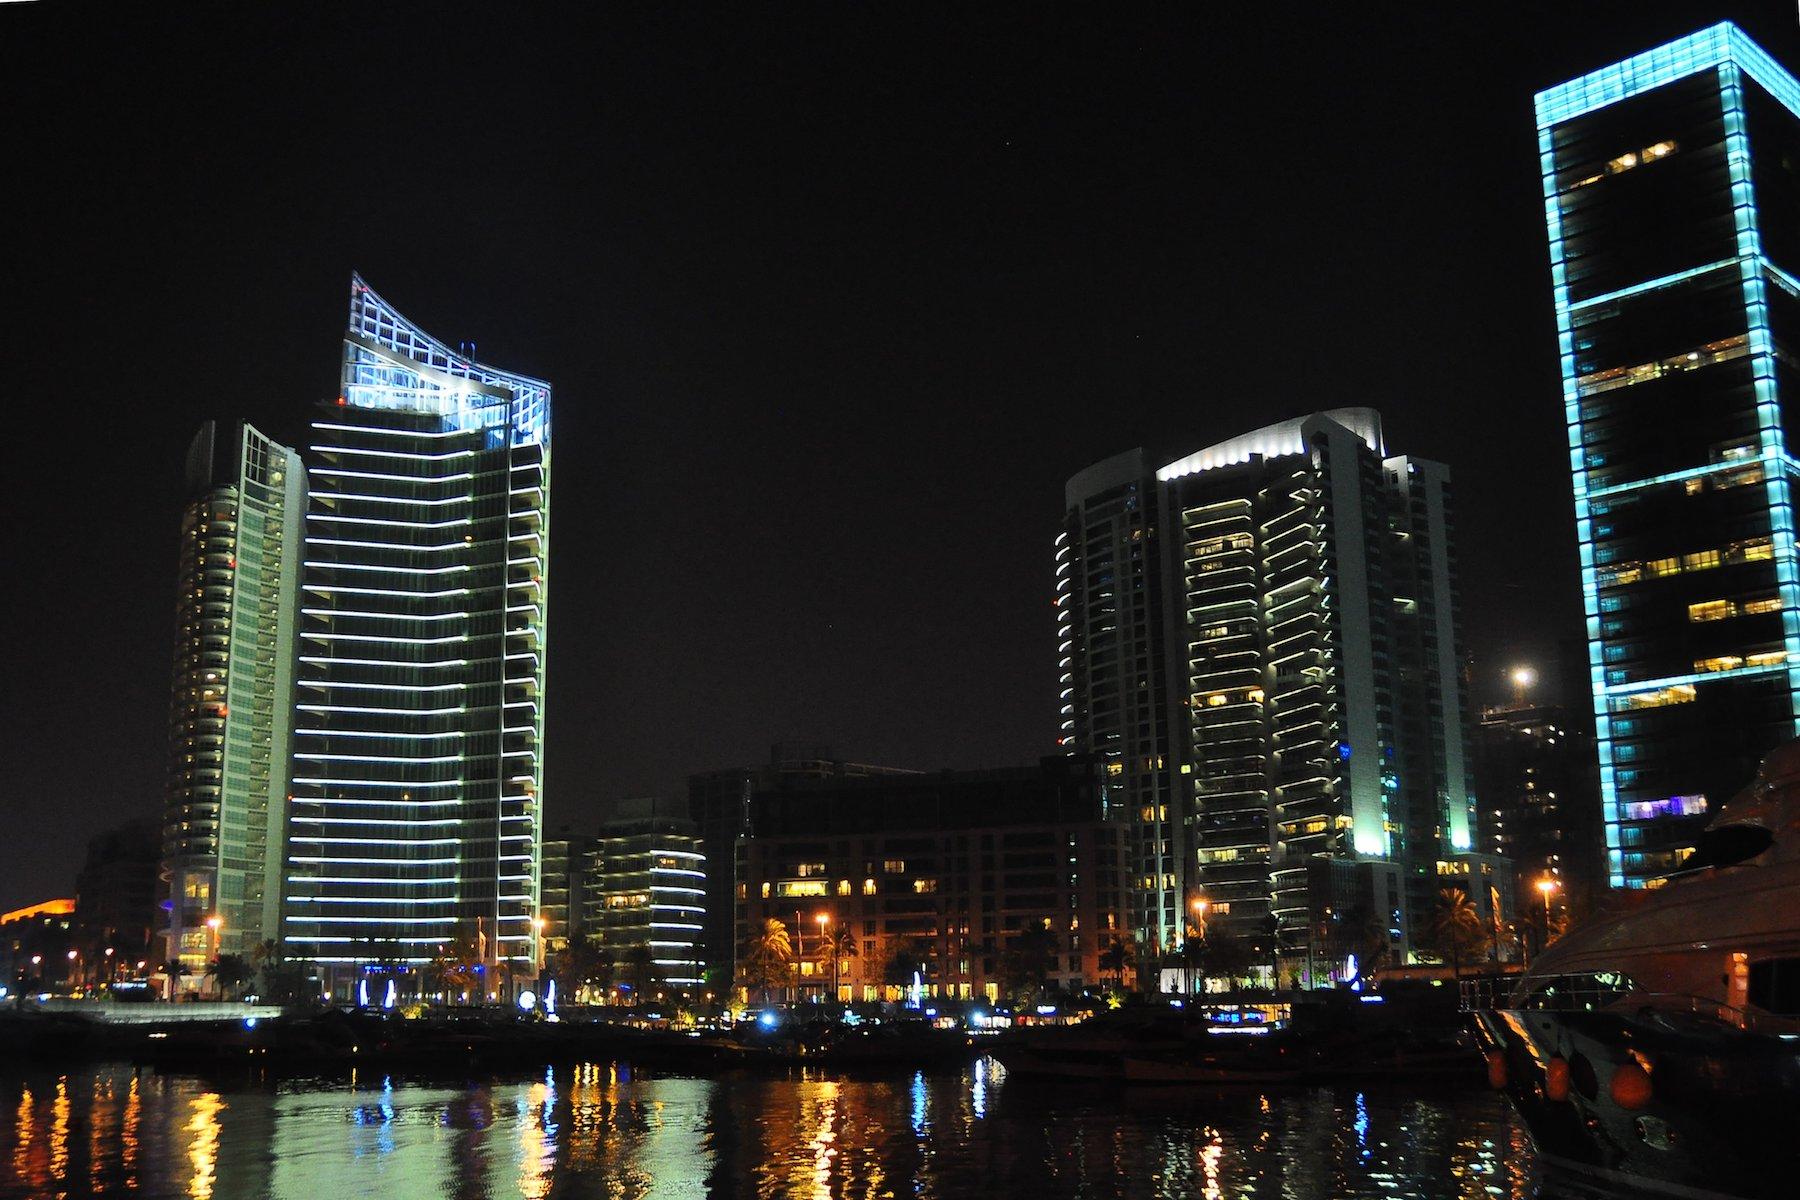 Zaitunay Bay, Downtown Beirut, Lebanon